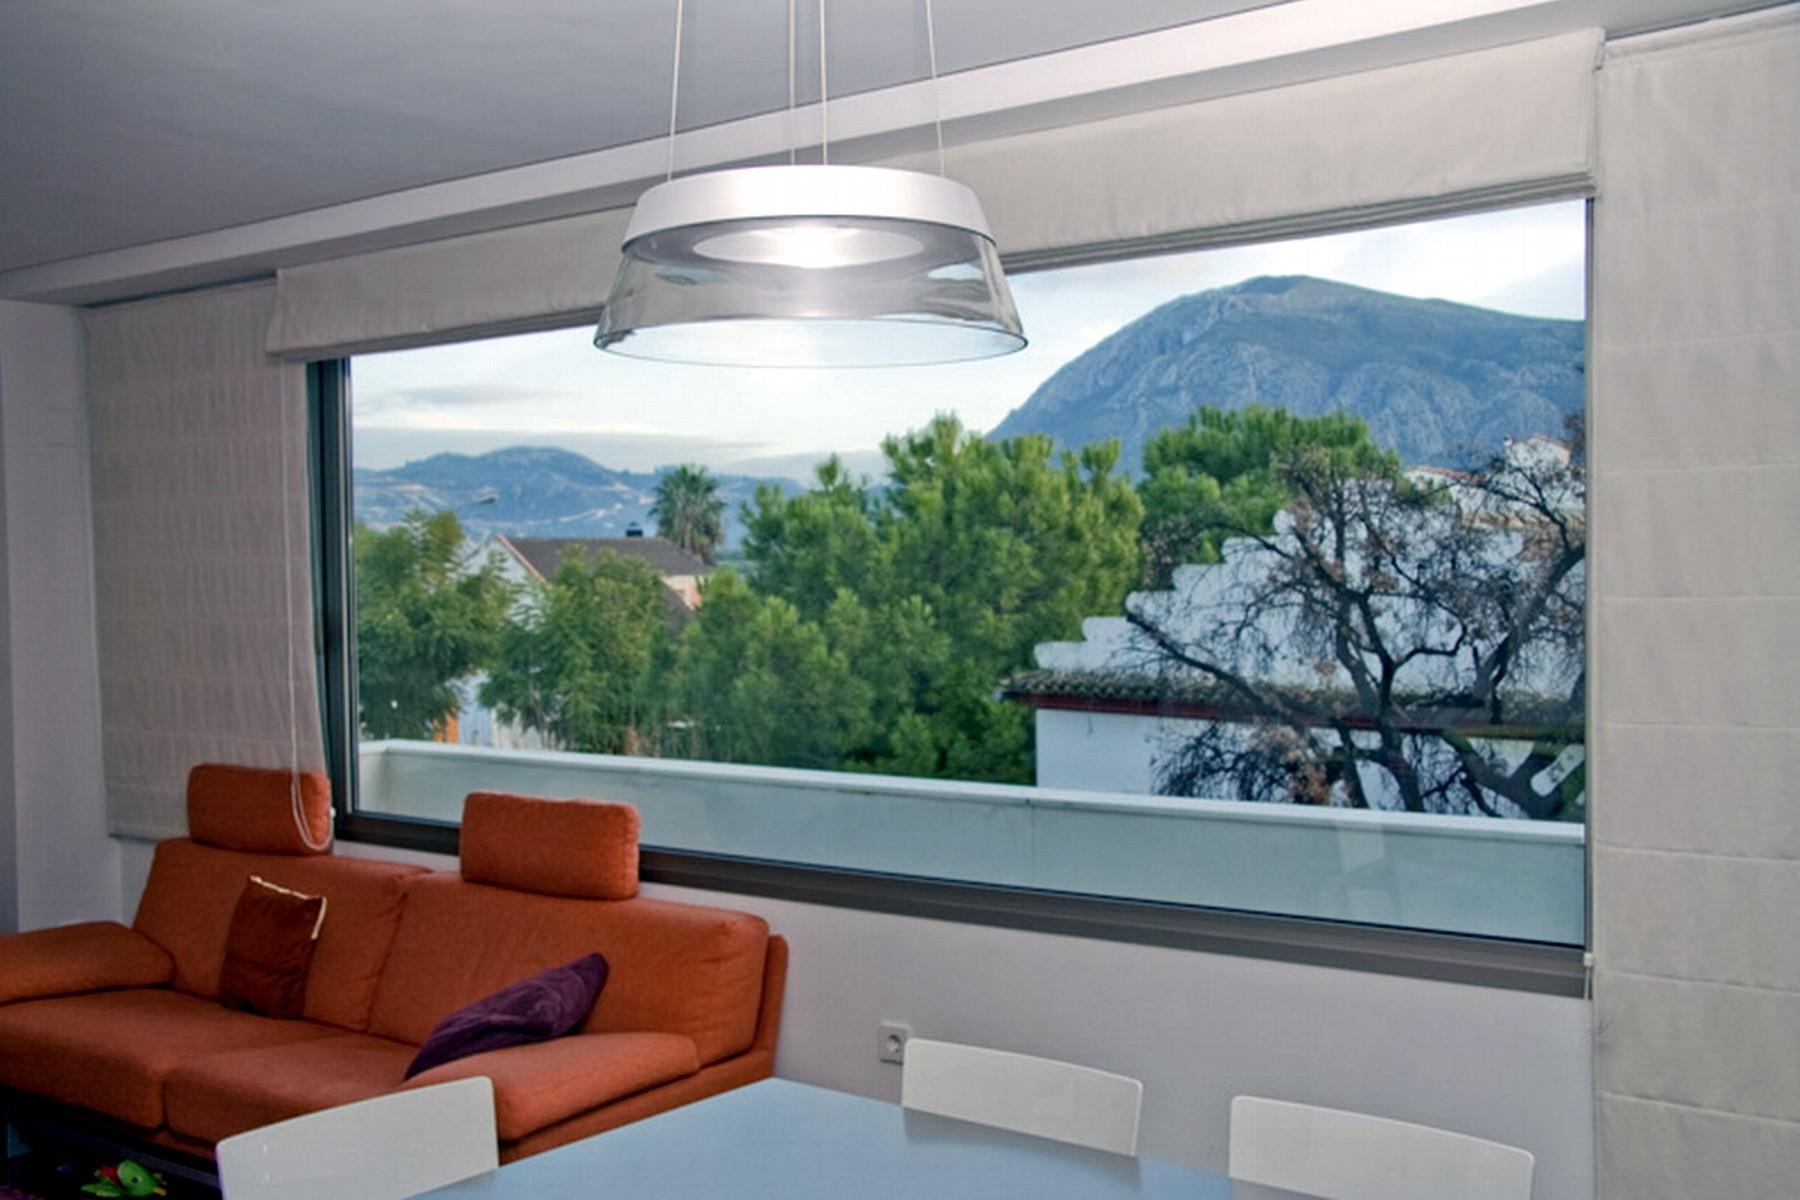 Imaginarq-166-Edificio-Viviendas-Pego-Alicante-09A